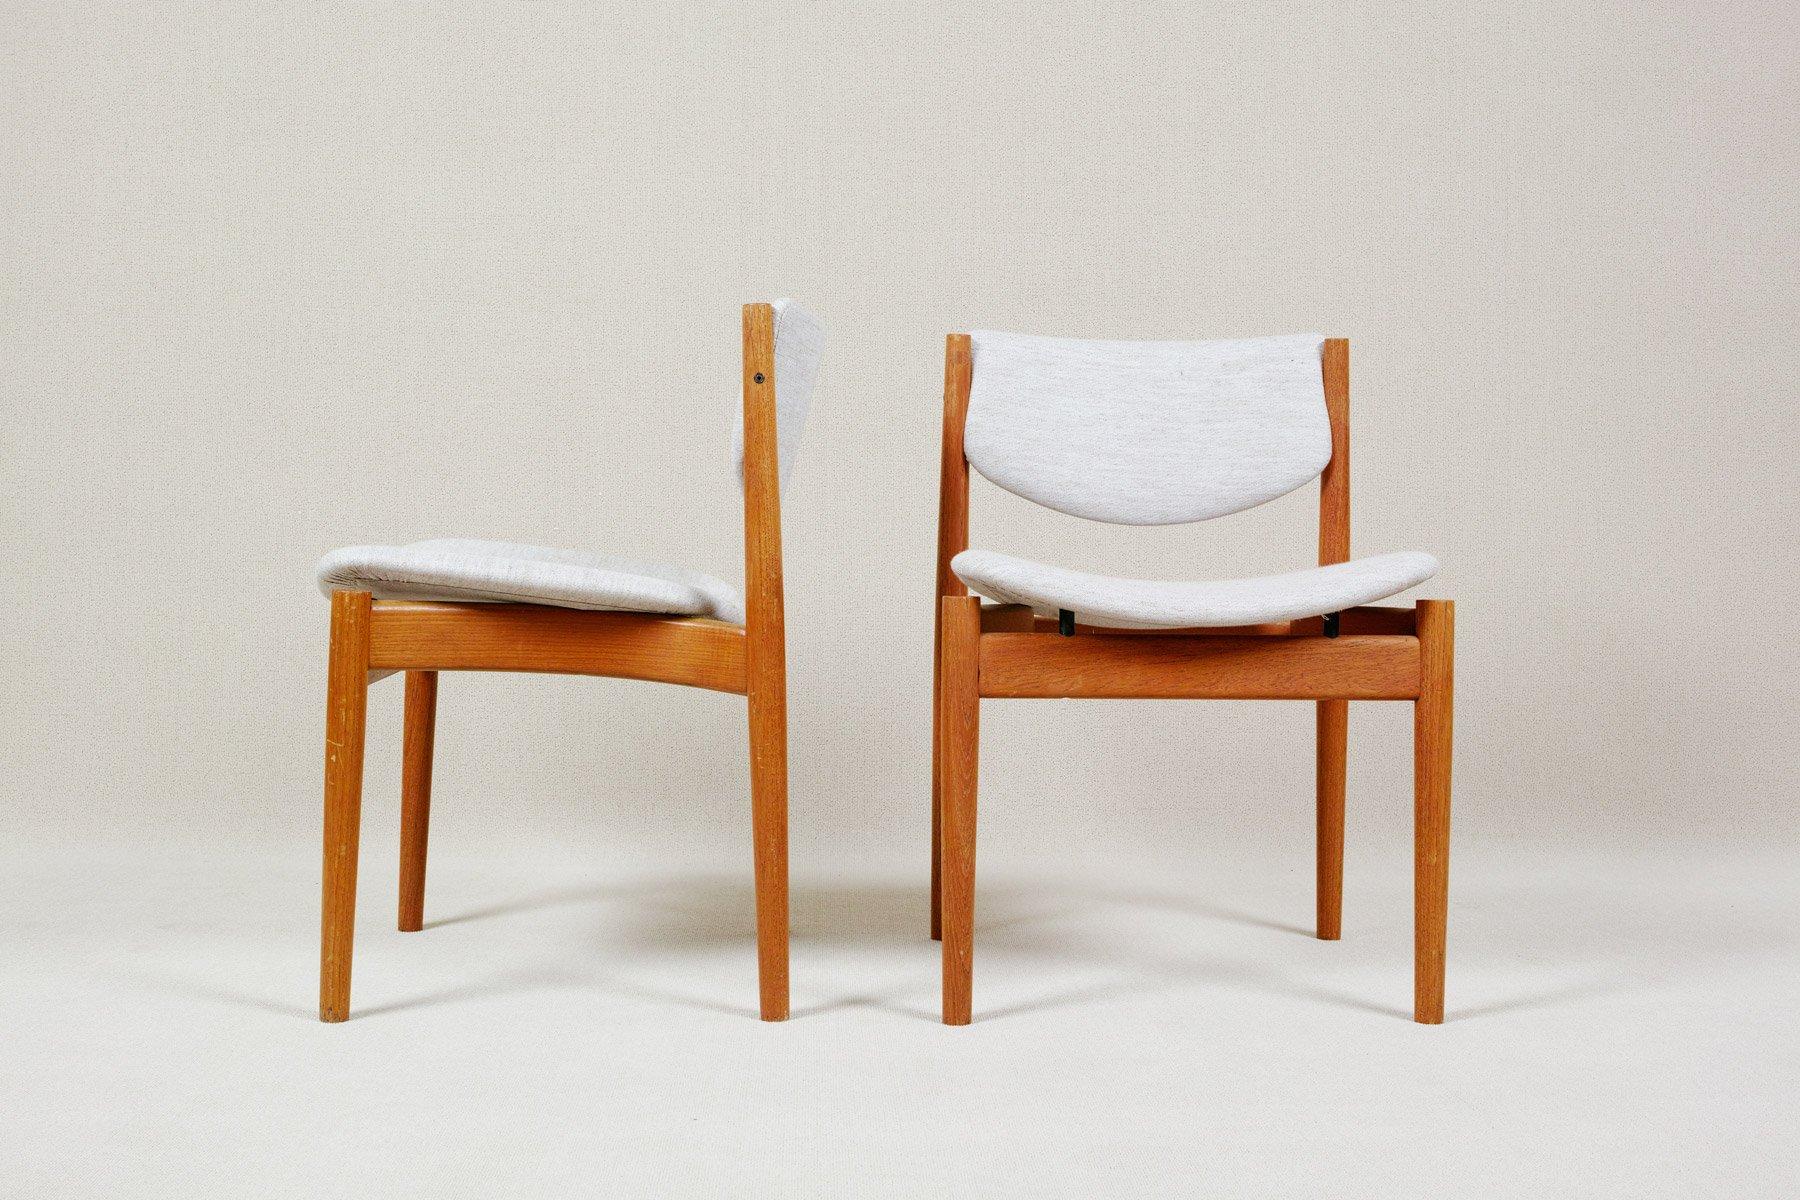 Delightful Dining Chairs Model 197 By Finn Juhl For France U0026 Søn, 1960s, Set Of 8